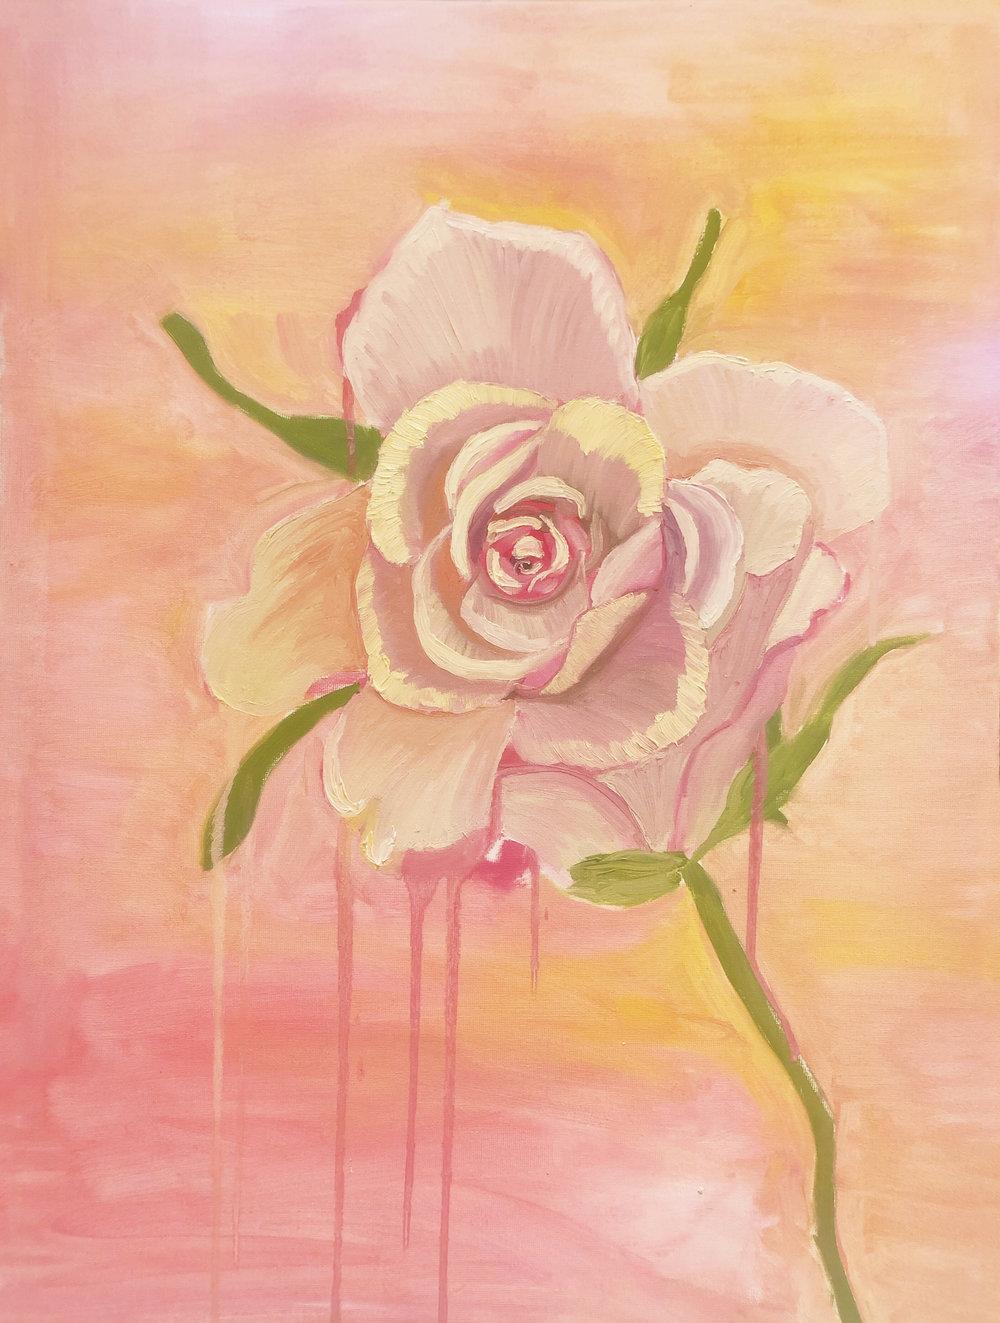 katrina-eugenia-philosophy-skincare-love-philosophy-amazing-grace-amazing-grace-ballet-rose-live-painting-oil-painting95.JPG